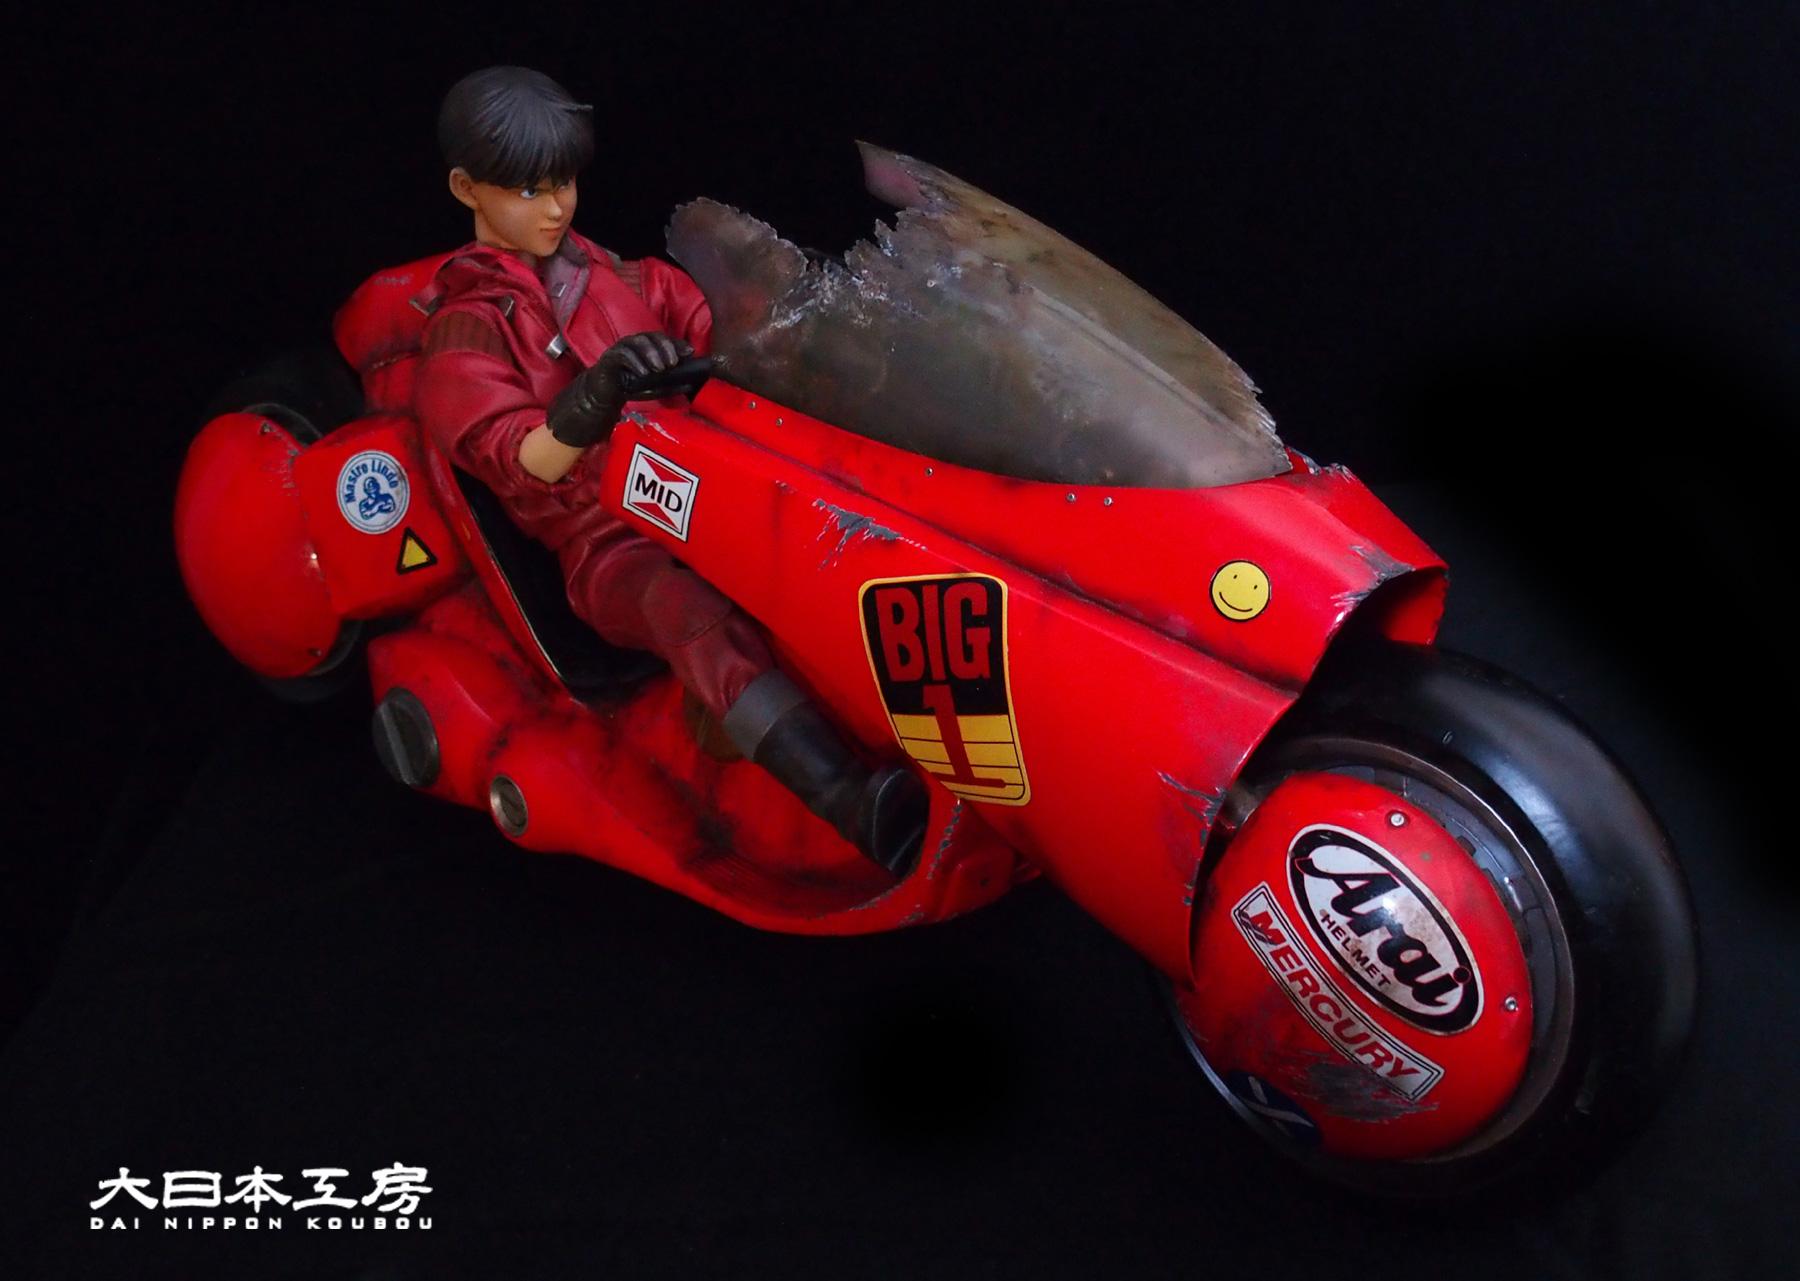 AKIRA  金田 金田のバイク アキラ BANDAI MEDICOM BM フィギュア